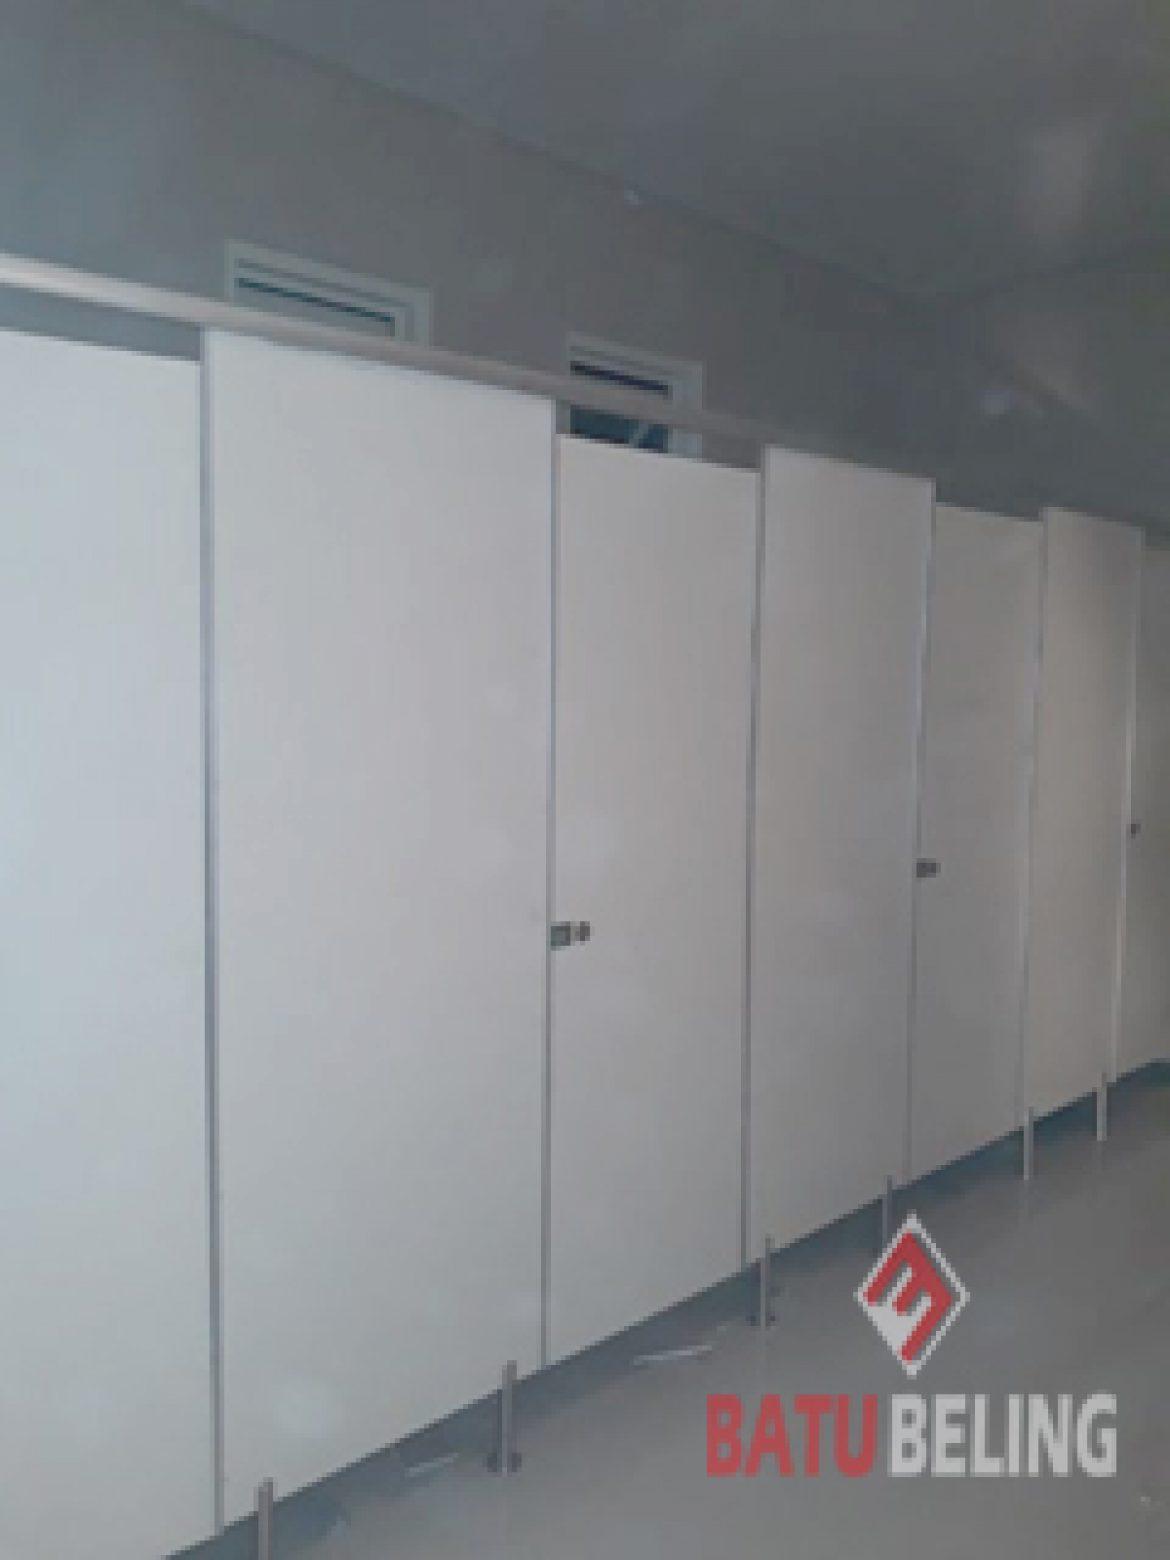 7 Unit Cubicle Toilet Phenolic Resin